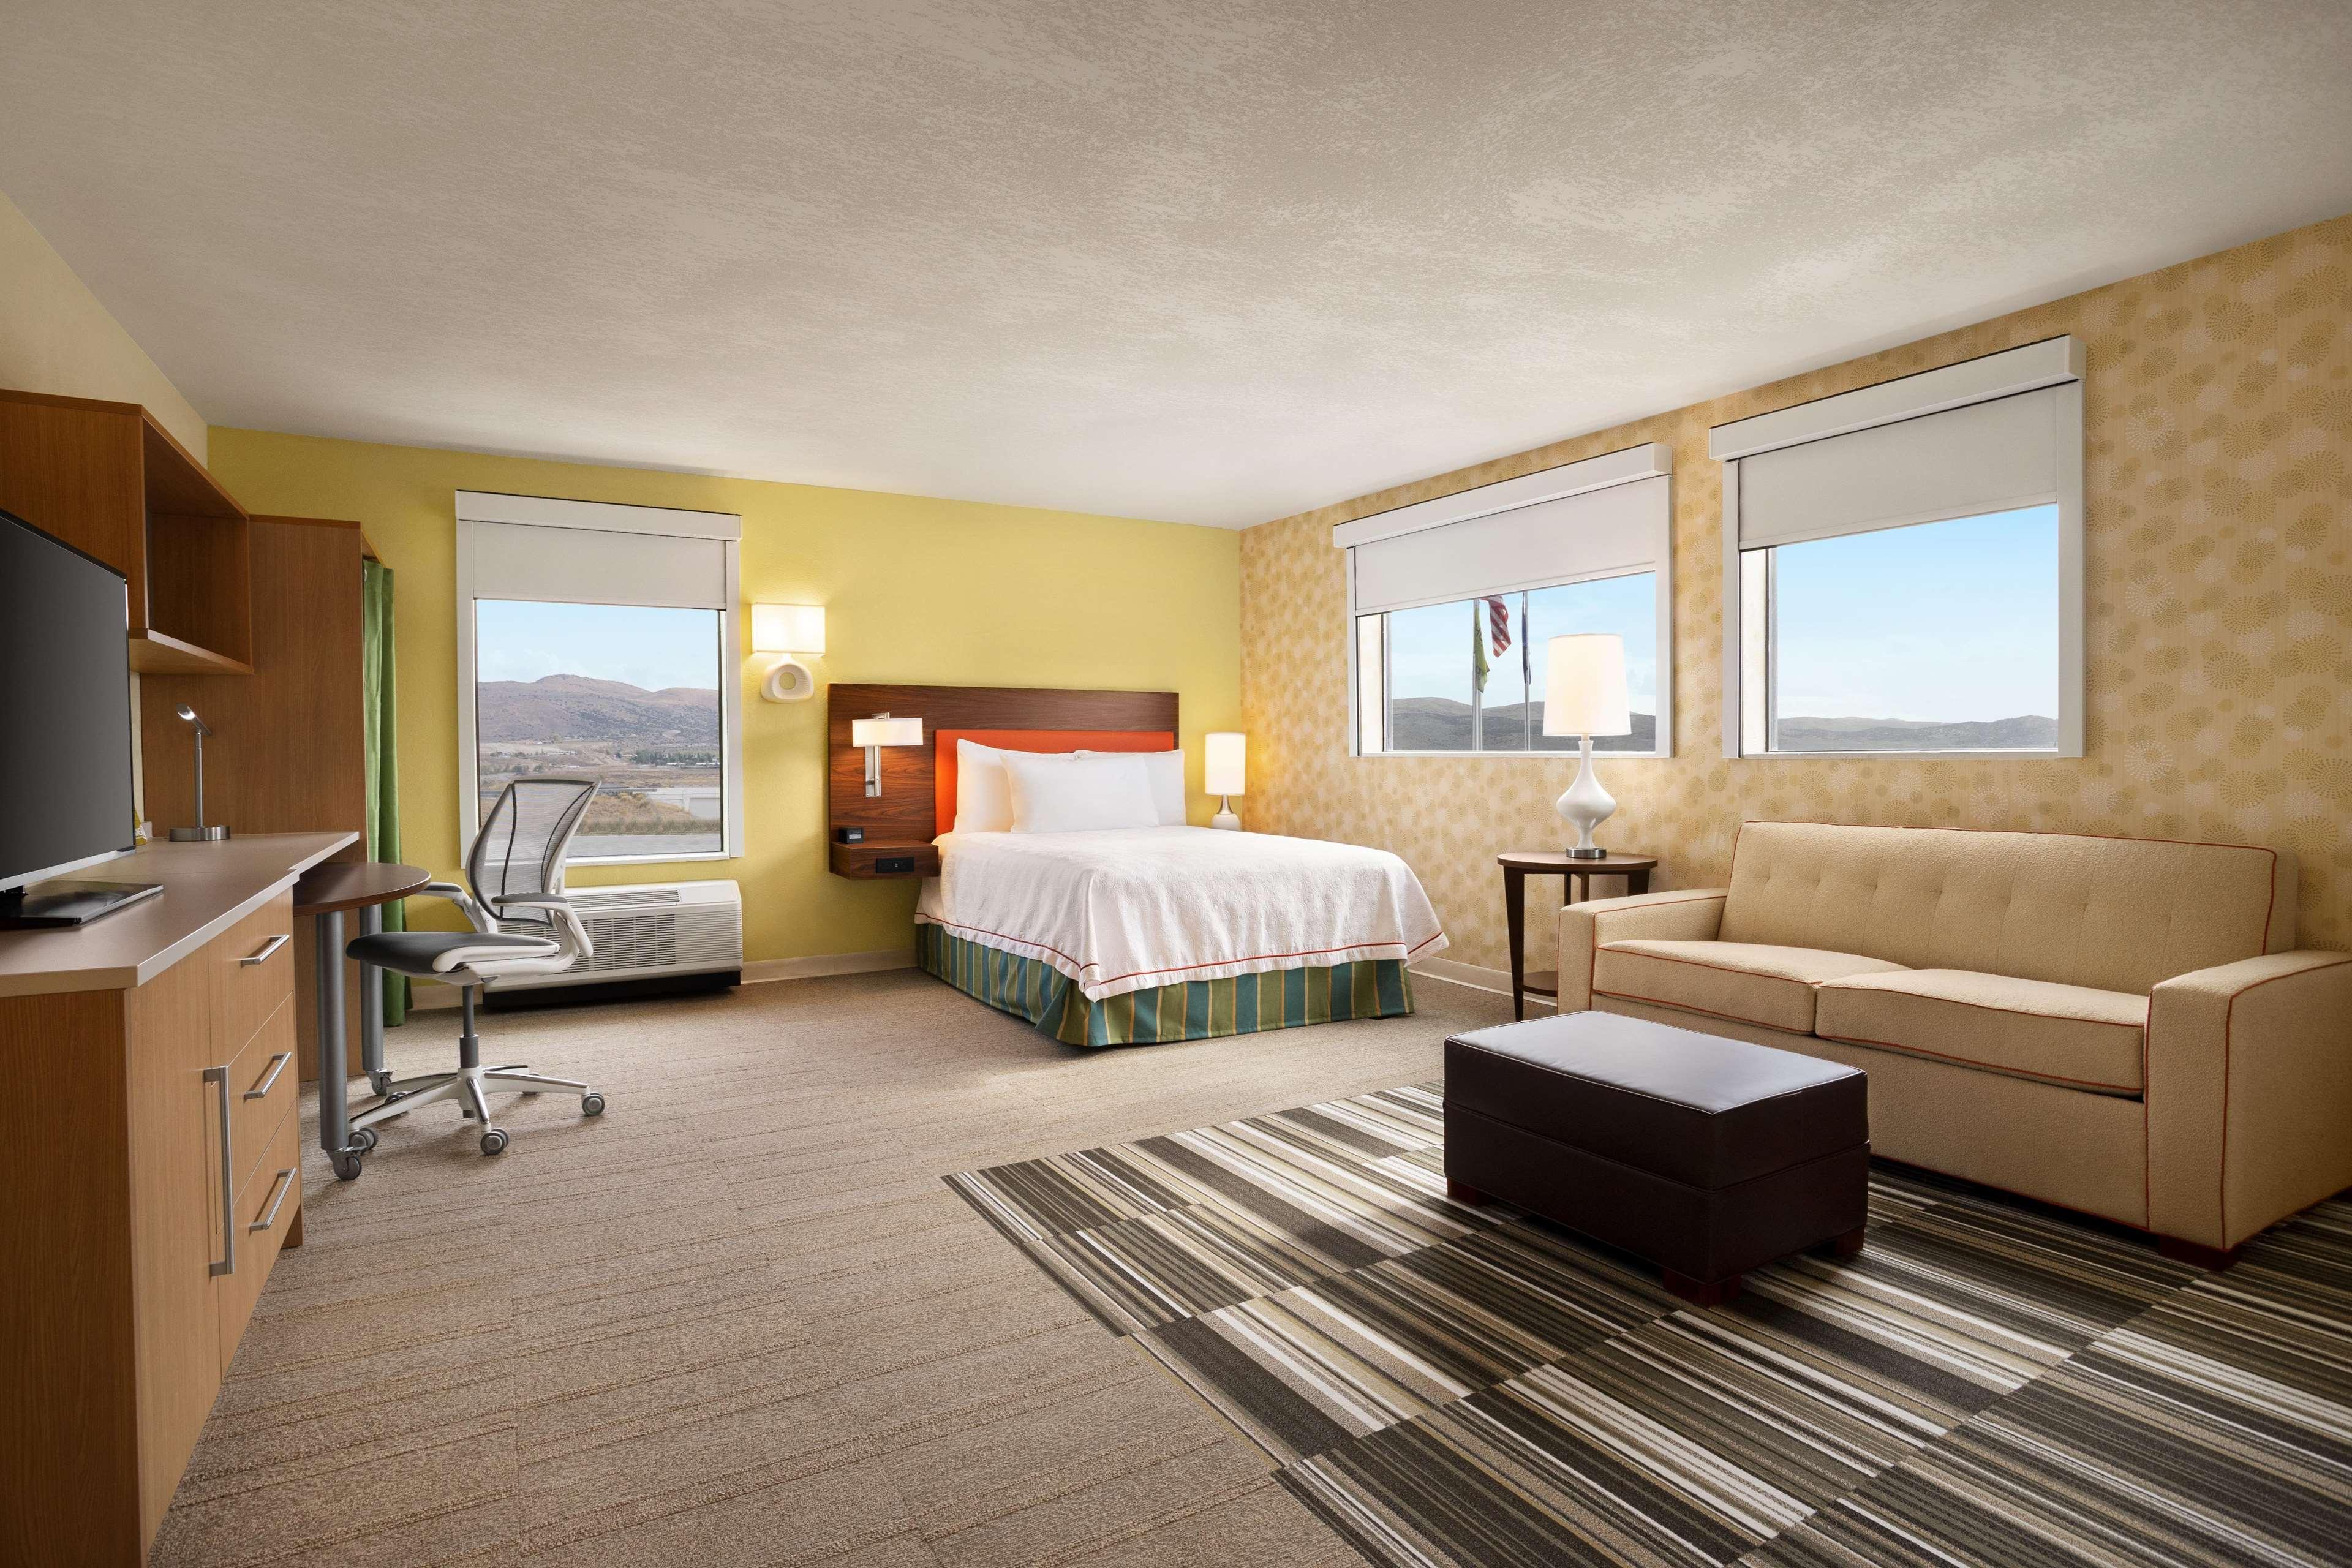 Home2 Suites by Hilton Elko image 25